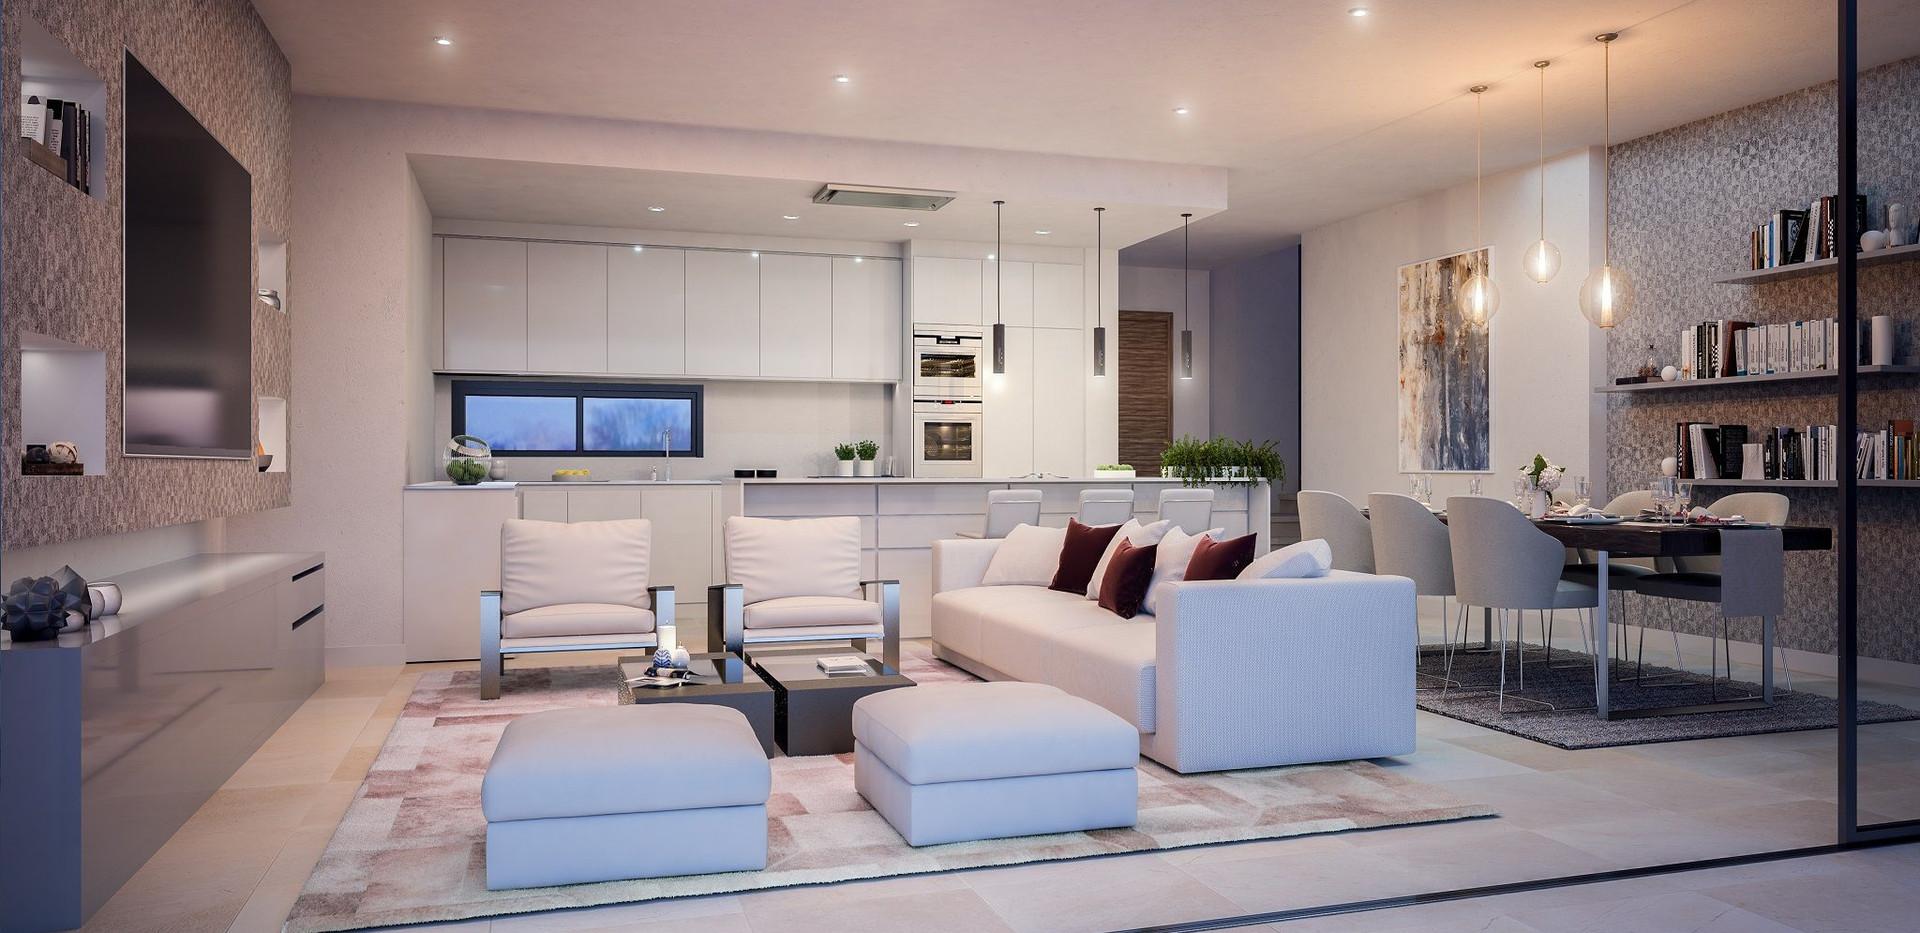 CaboRoyale-Livingroom-Type-B-1.jpg